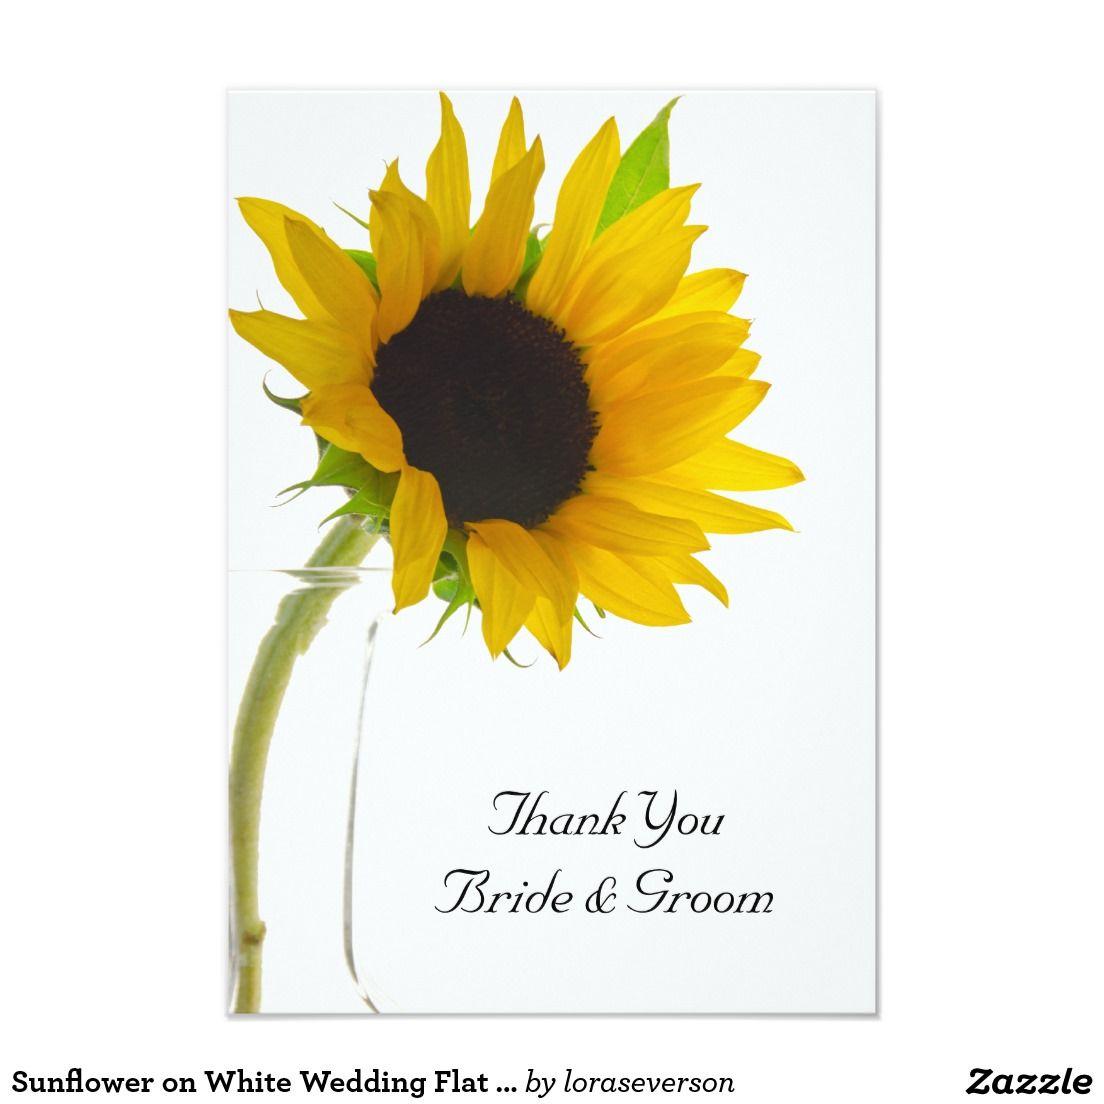 Sunflower on White Wedding Flat Thank You Notes Card | Sunflower ...